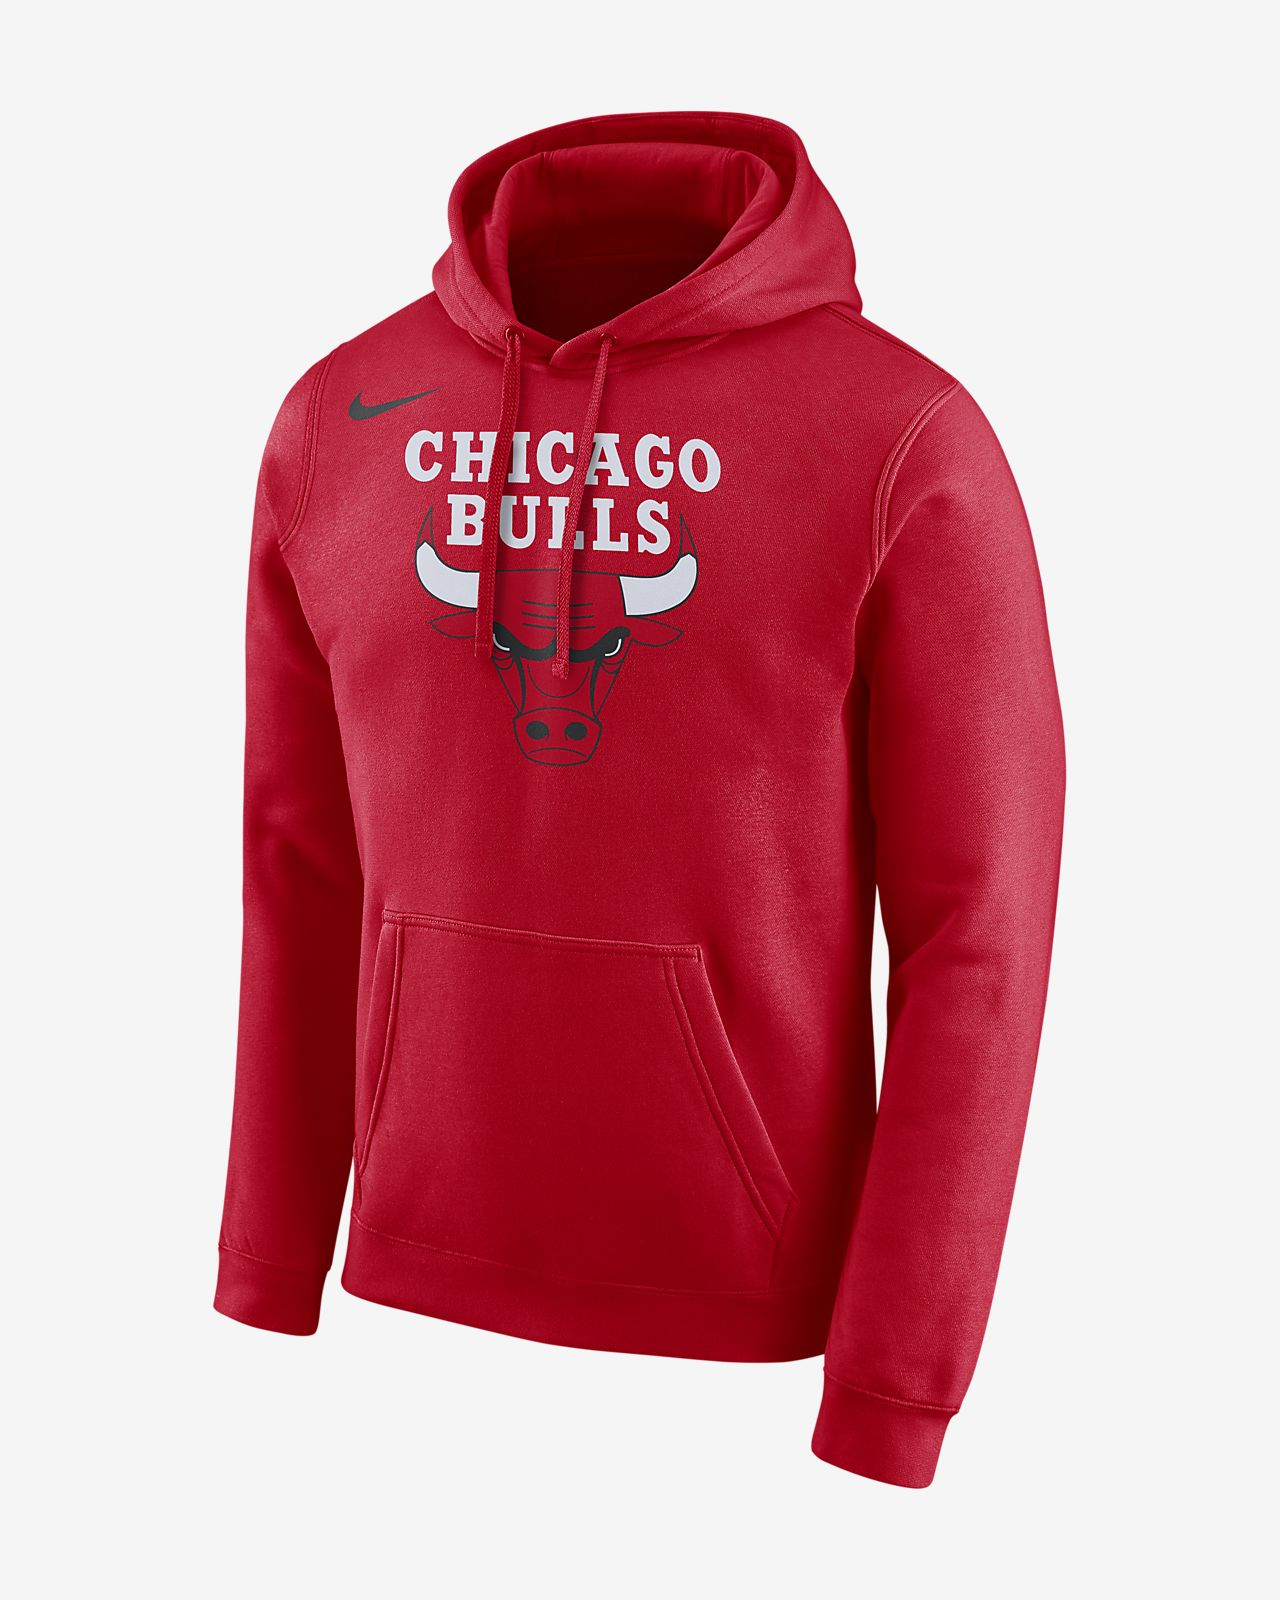 chicago bulls nike men 39 s logo nba hoodie. Black Bedroom Furniture Sets. Home Design Ideas